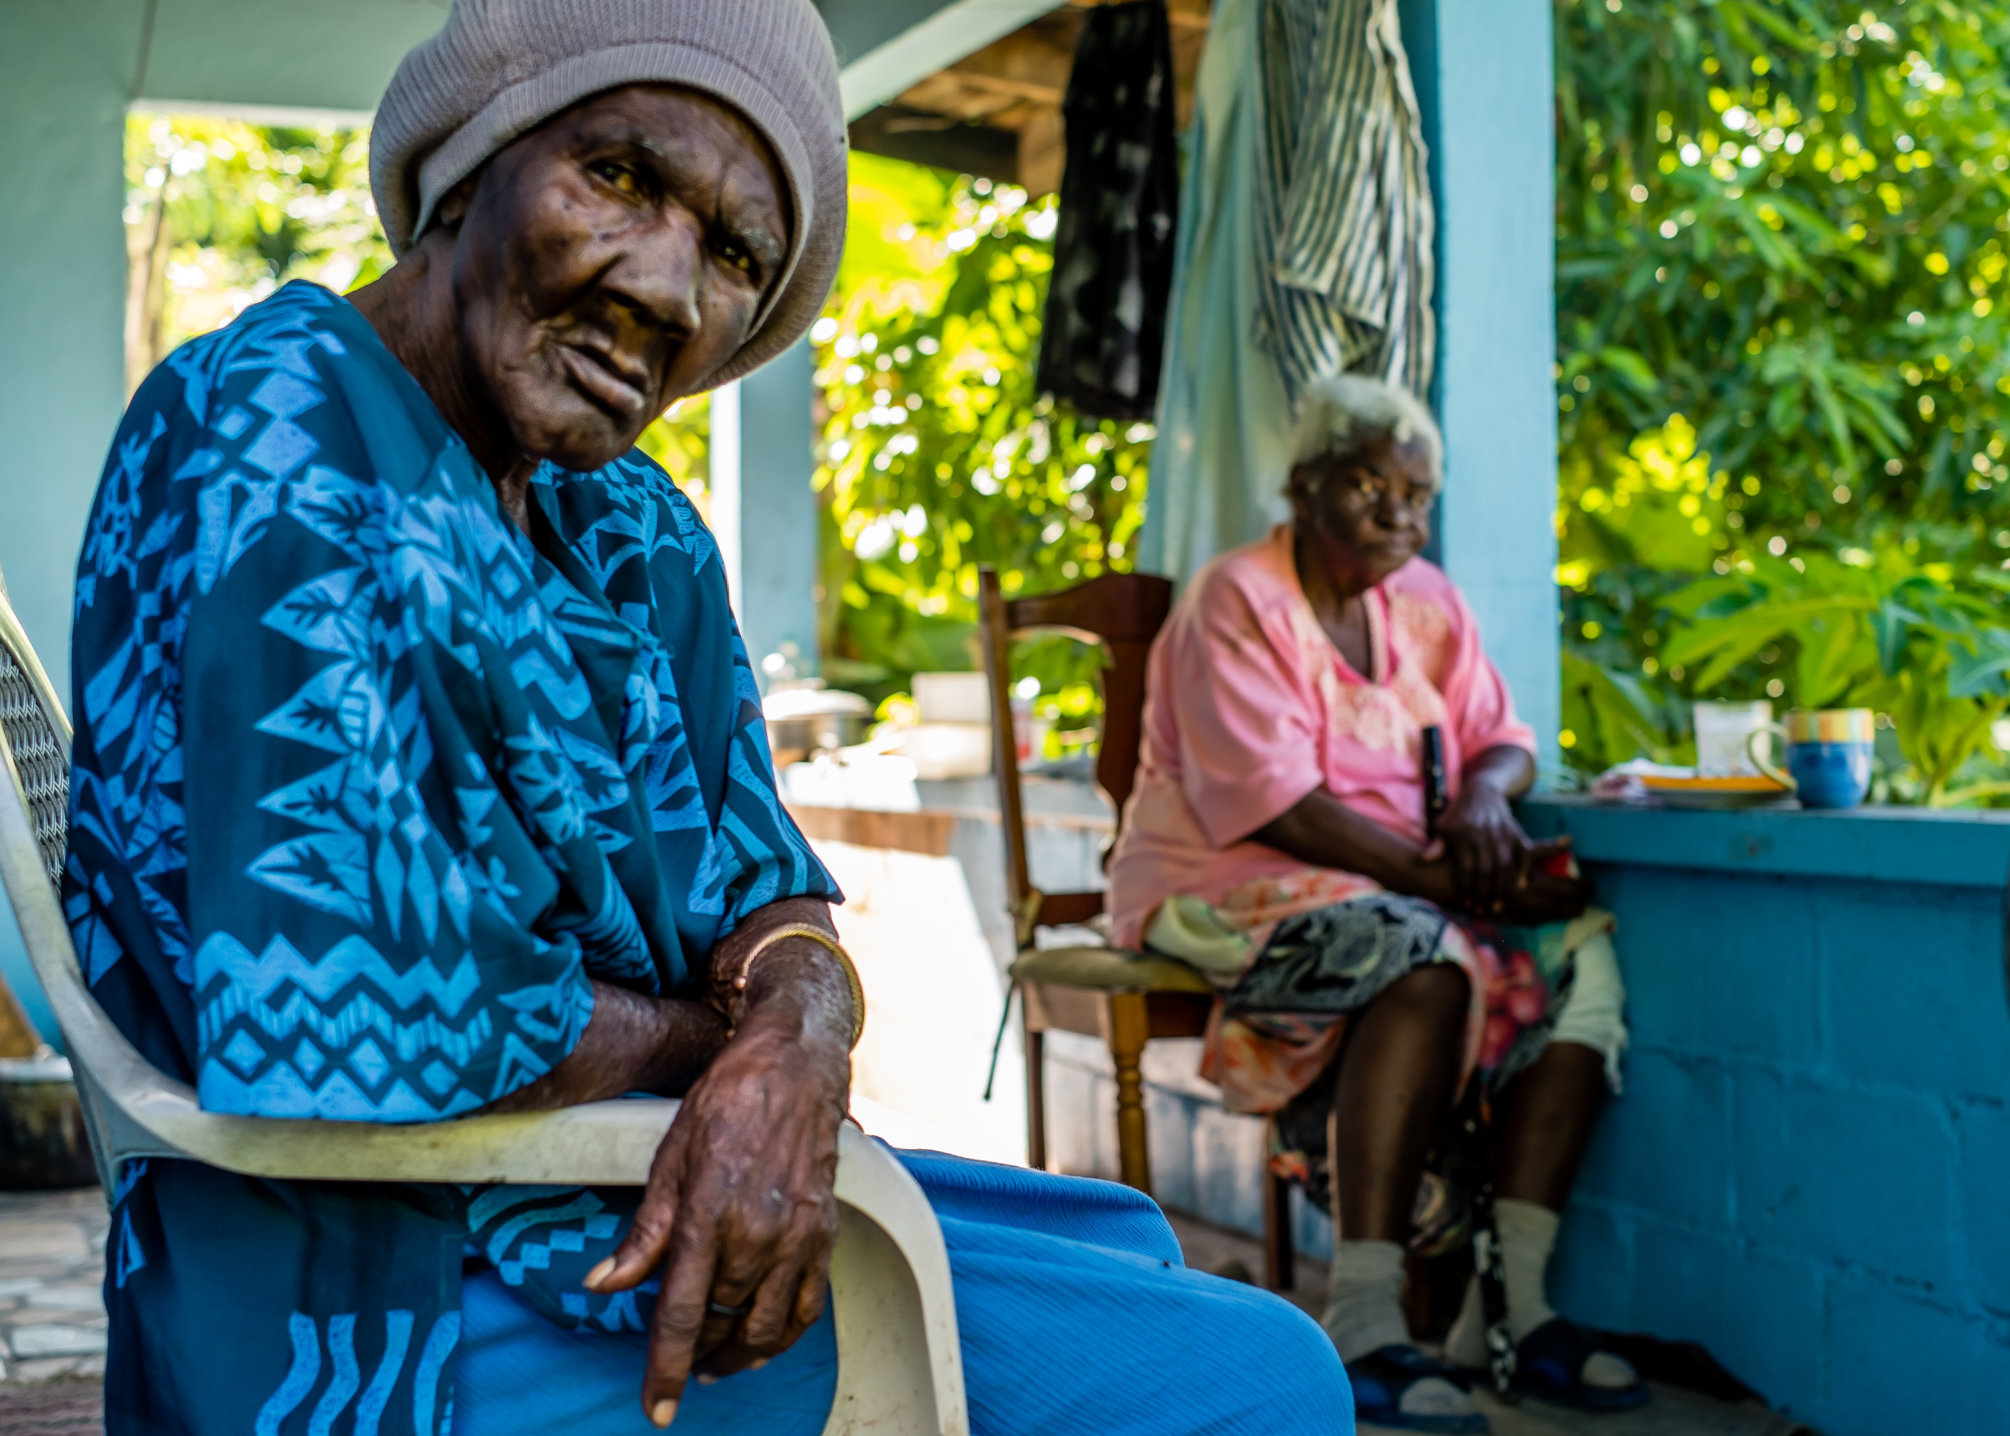 Caribbean, impressions-4523.jpg